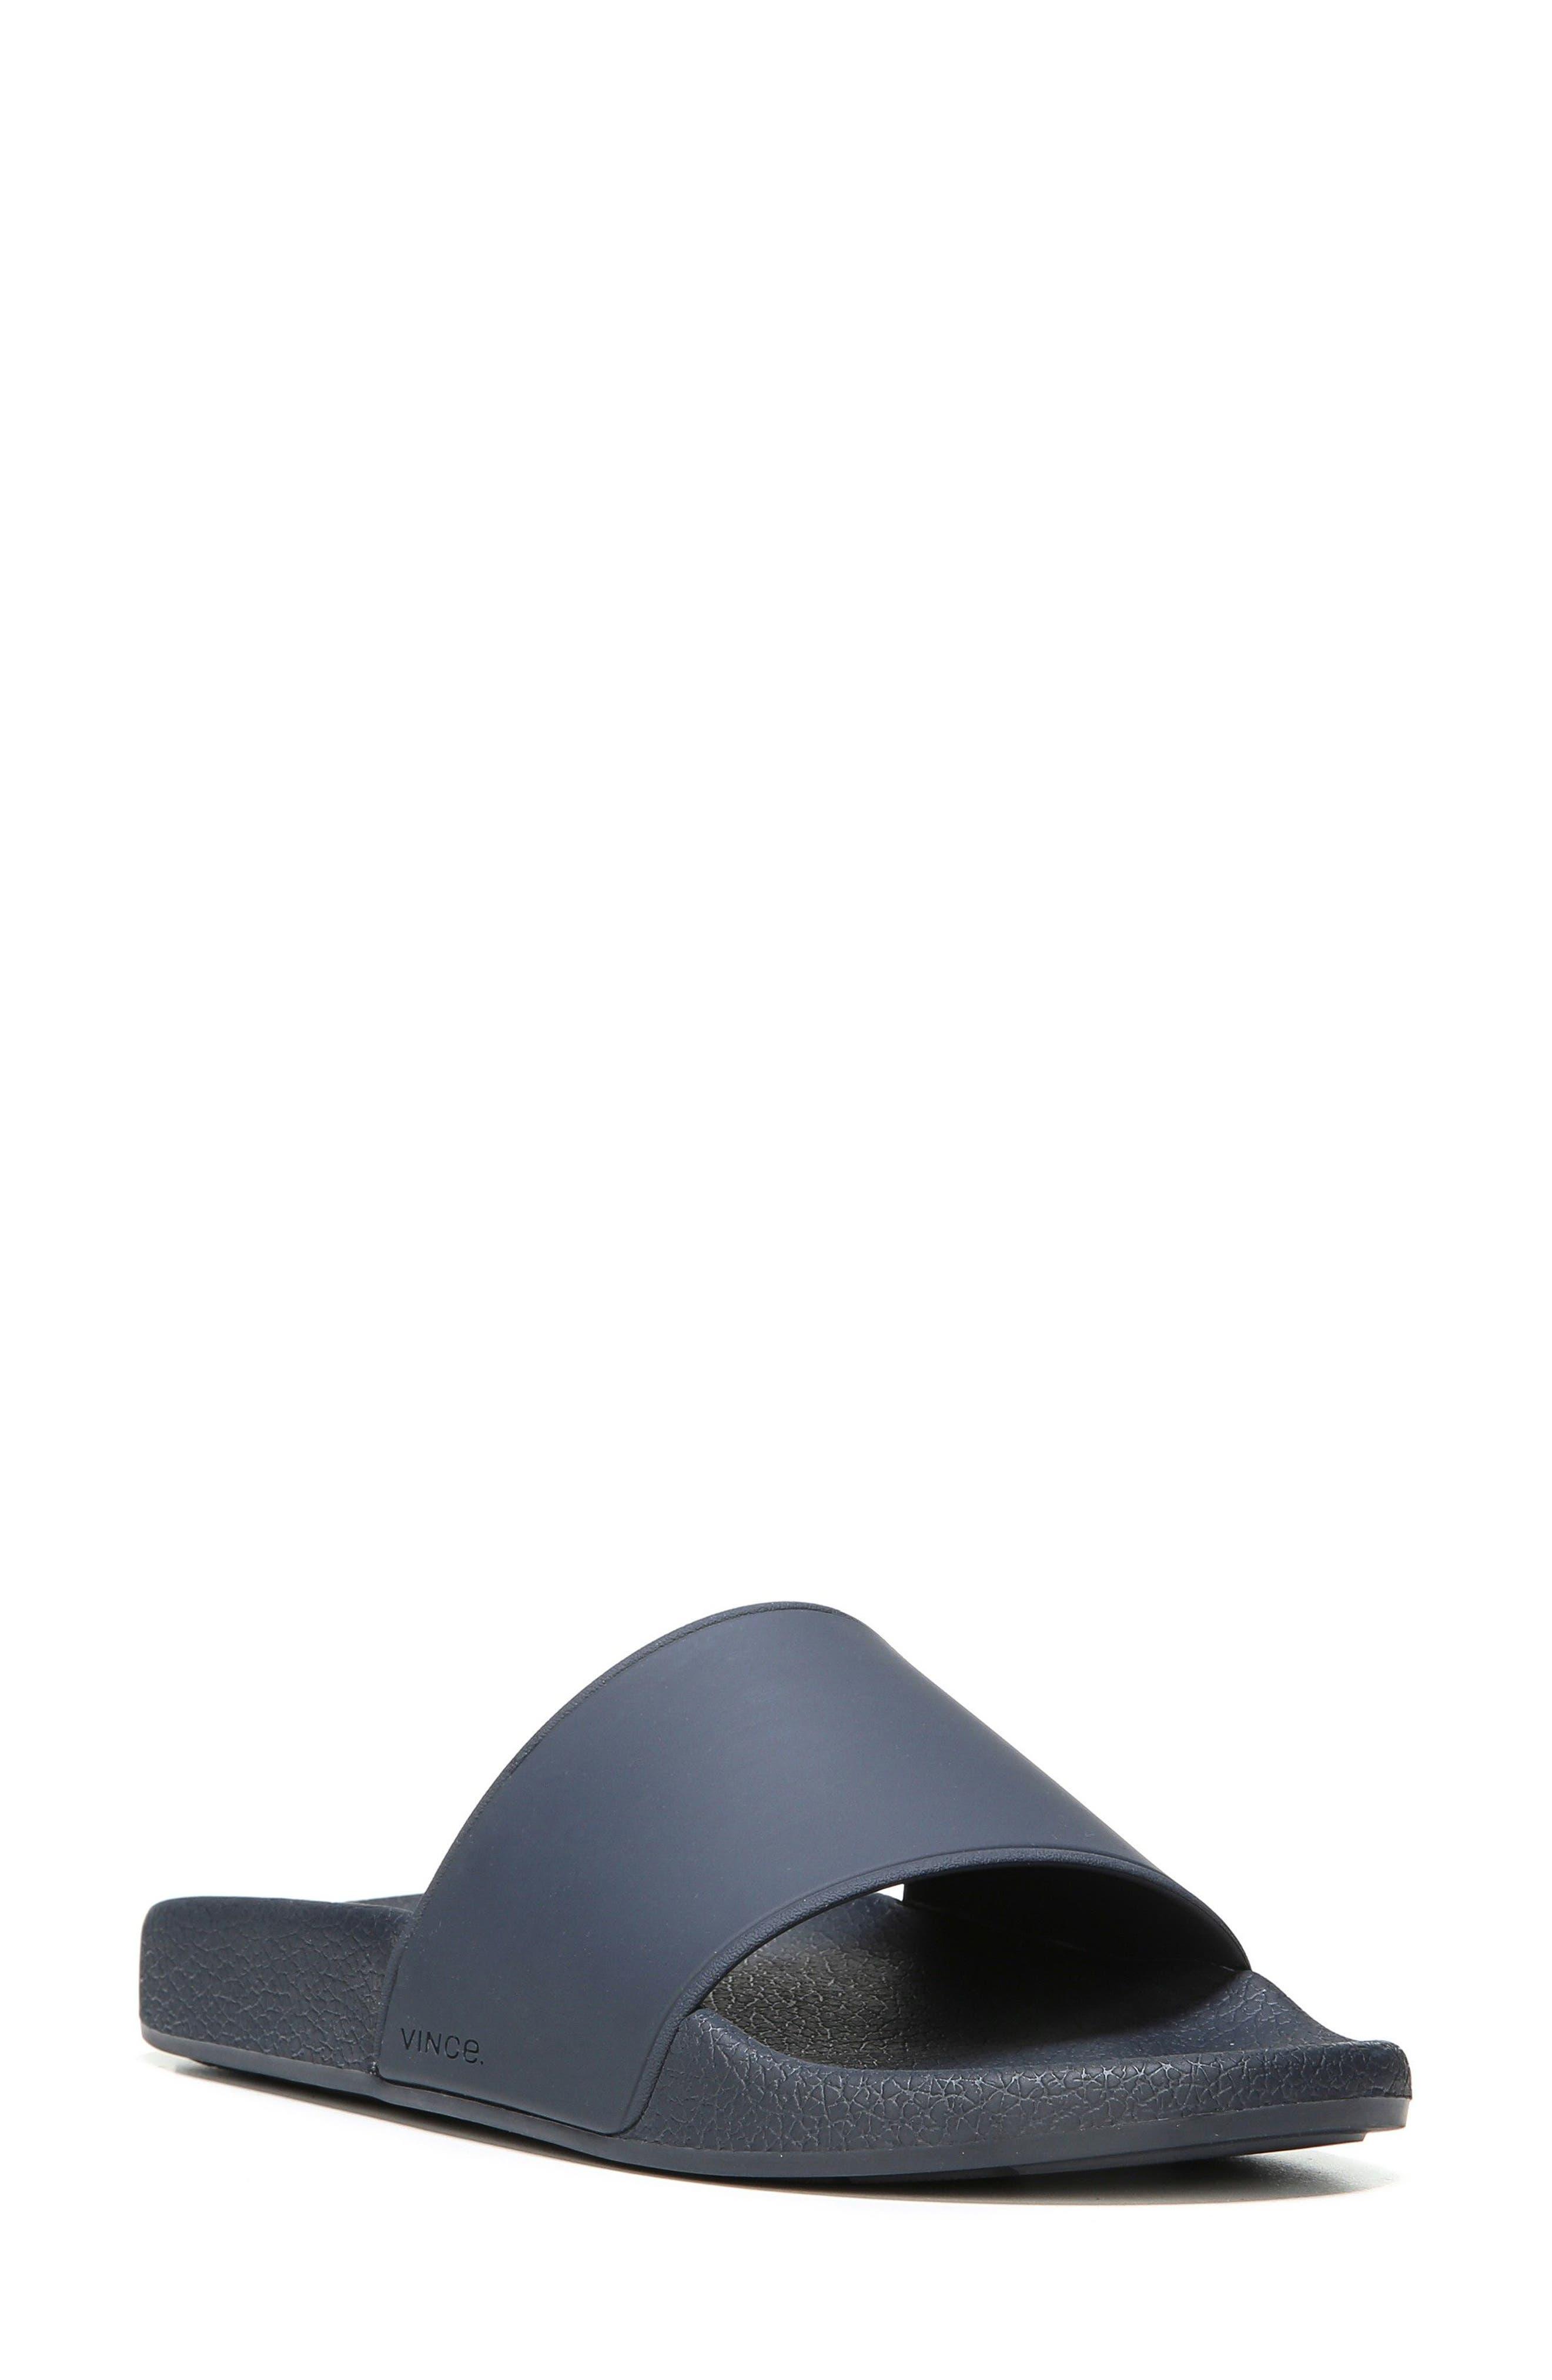 Westcoast Slide Sandal,                         Main,                         color, Coastal/ Navy